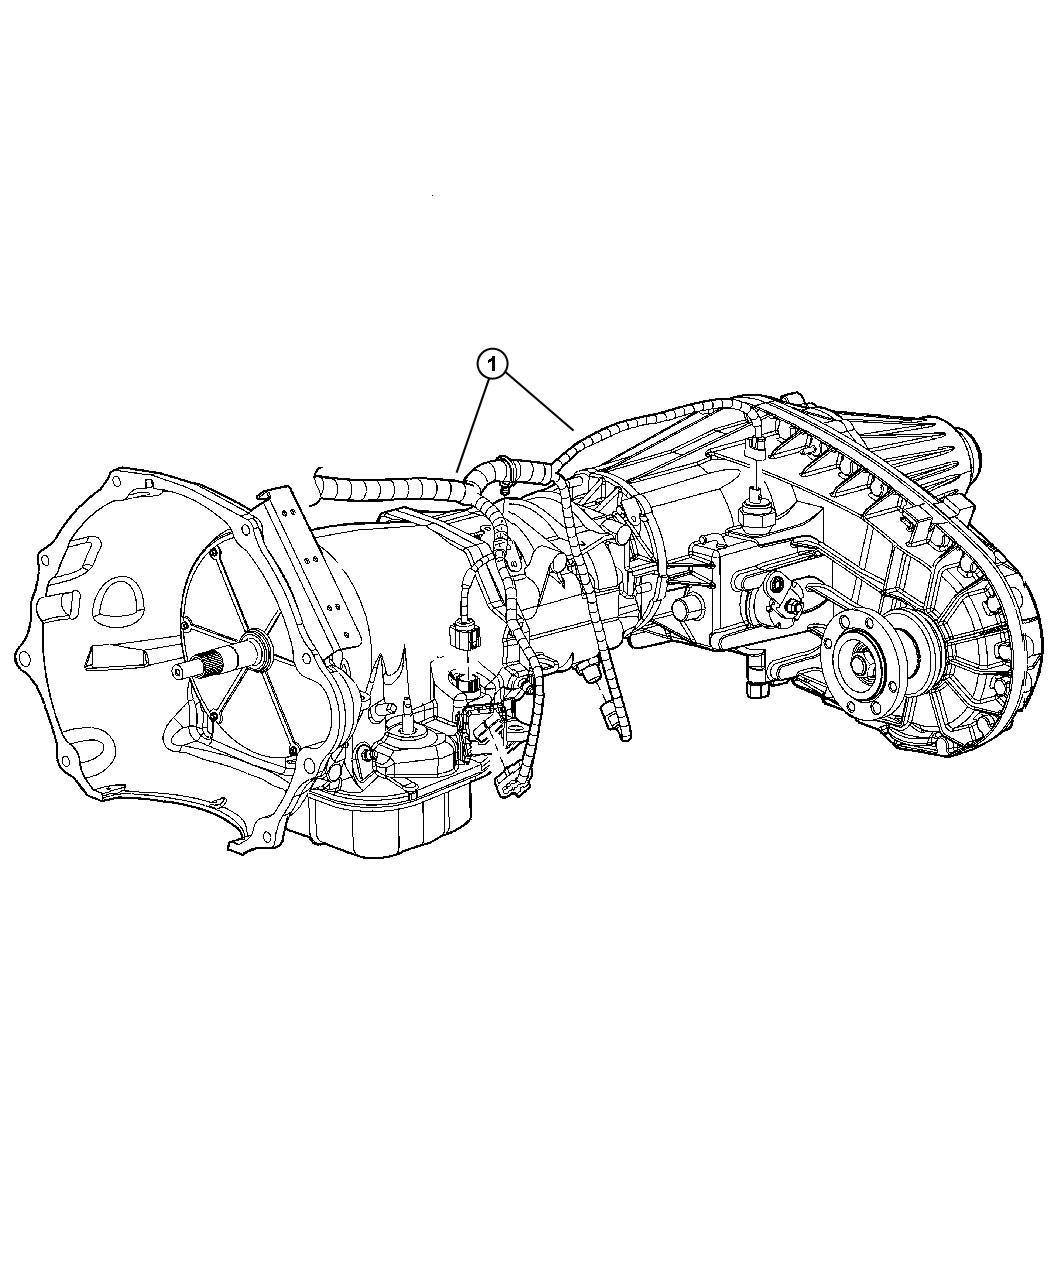 Rav4 Transfer Case Diagram - Wiring Diagrams ROCK